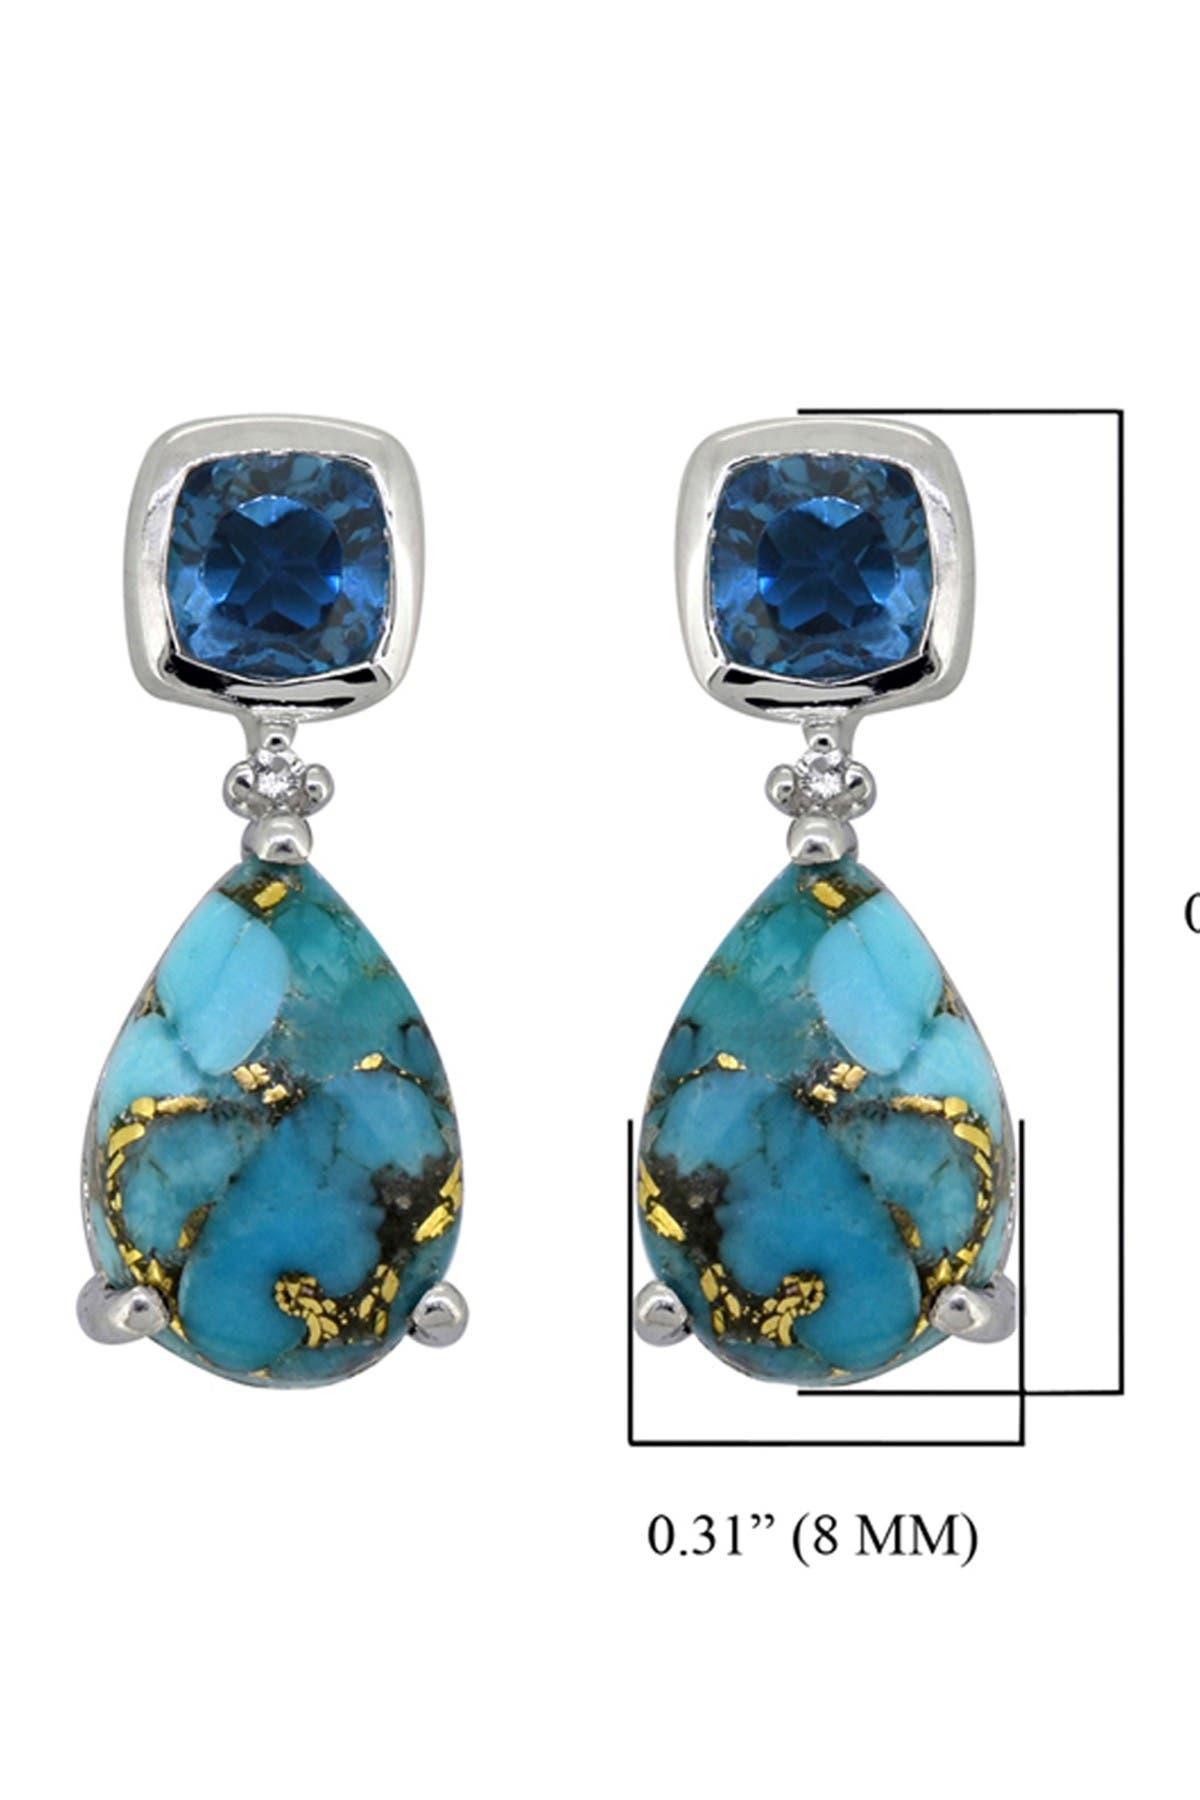 Image of Nitya Sterling Silver Blue Copper Turquoise London Blue Topaz Earrings